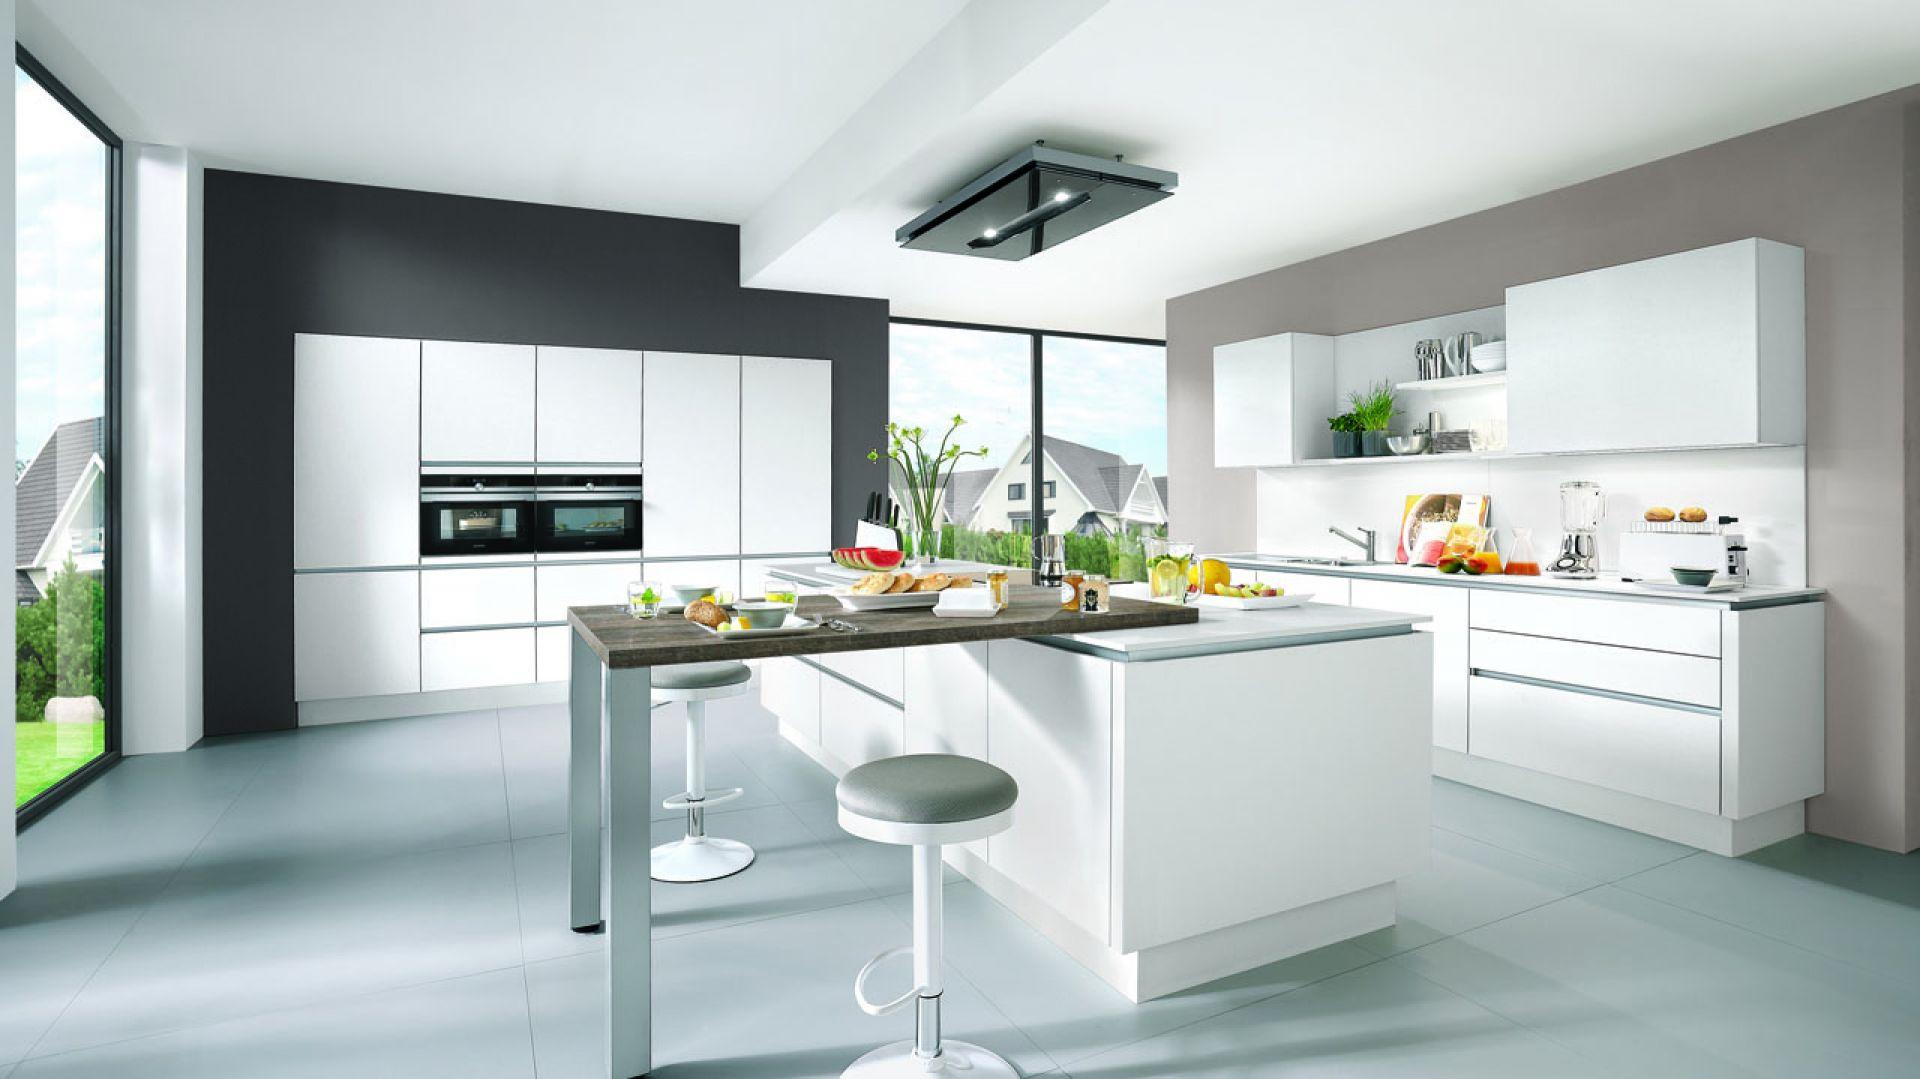 Białe meble do kuchni z kolekcji Laser dostępne w ofercie firmy Verle Küchen. Fot. Verle Küchen